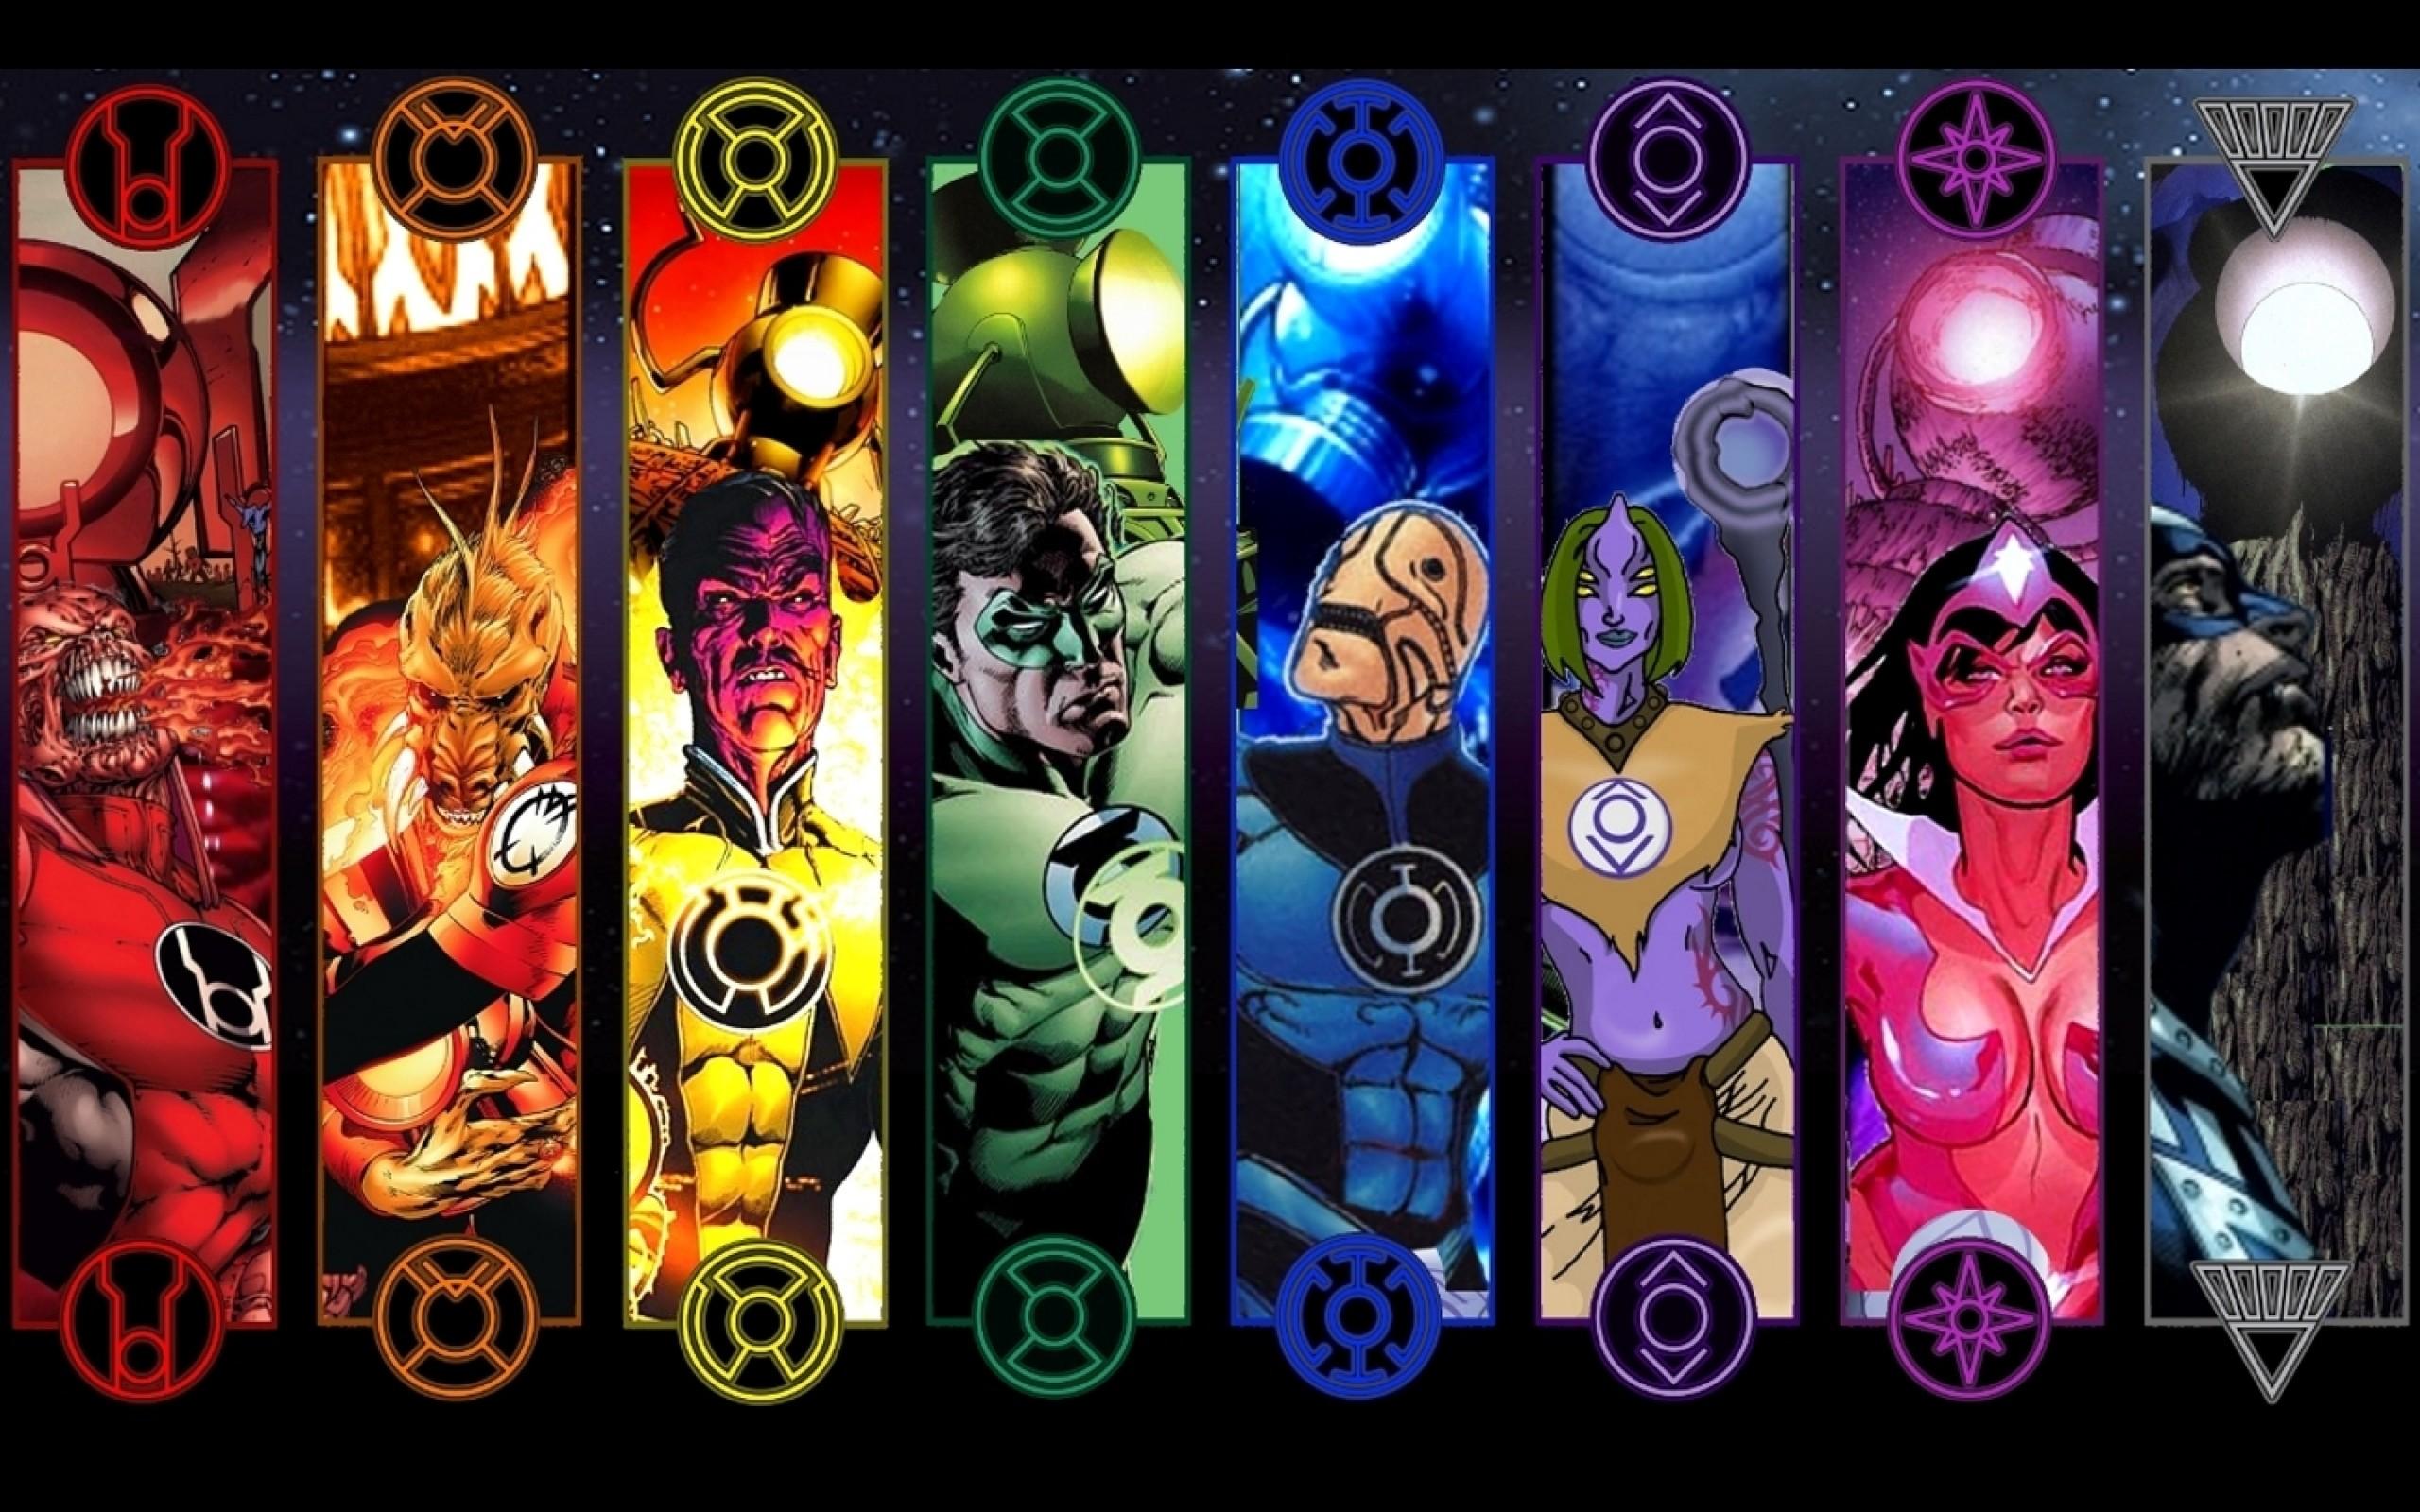 Agent Orange Atrocitus Black Lantern Corps Blue Lantern Dc Comics Green  Lantern Indigo Tribe Red Lantern Corps free iPhone or Android Full HD  wallpaper.